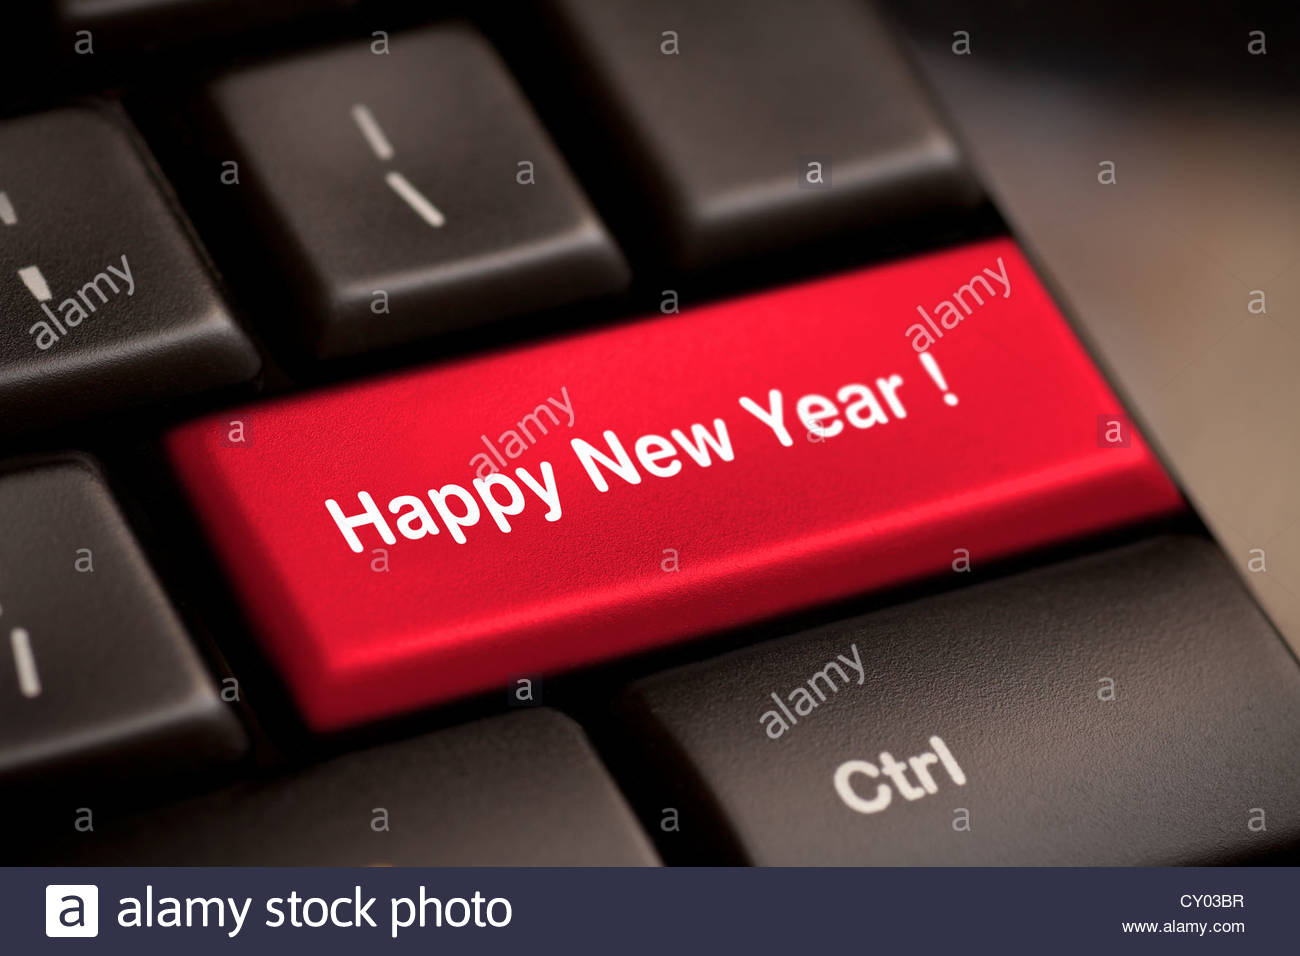 happy new year message, keyboard enter key - Stock Image